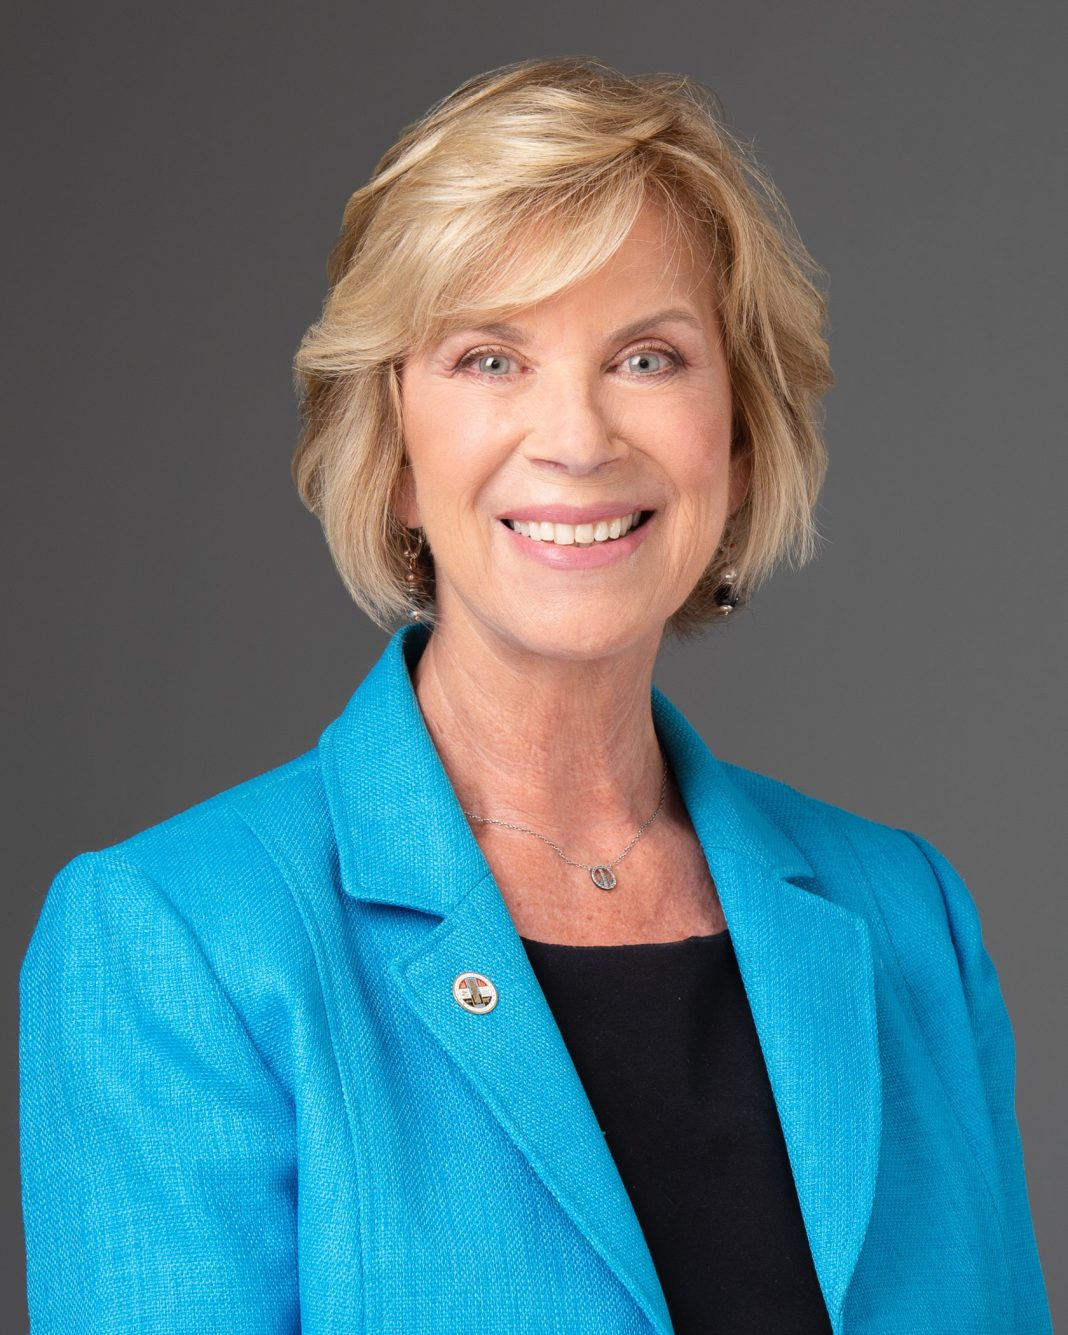 Photo of Los Angeles County Supervisor Janice Hahn.